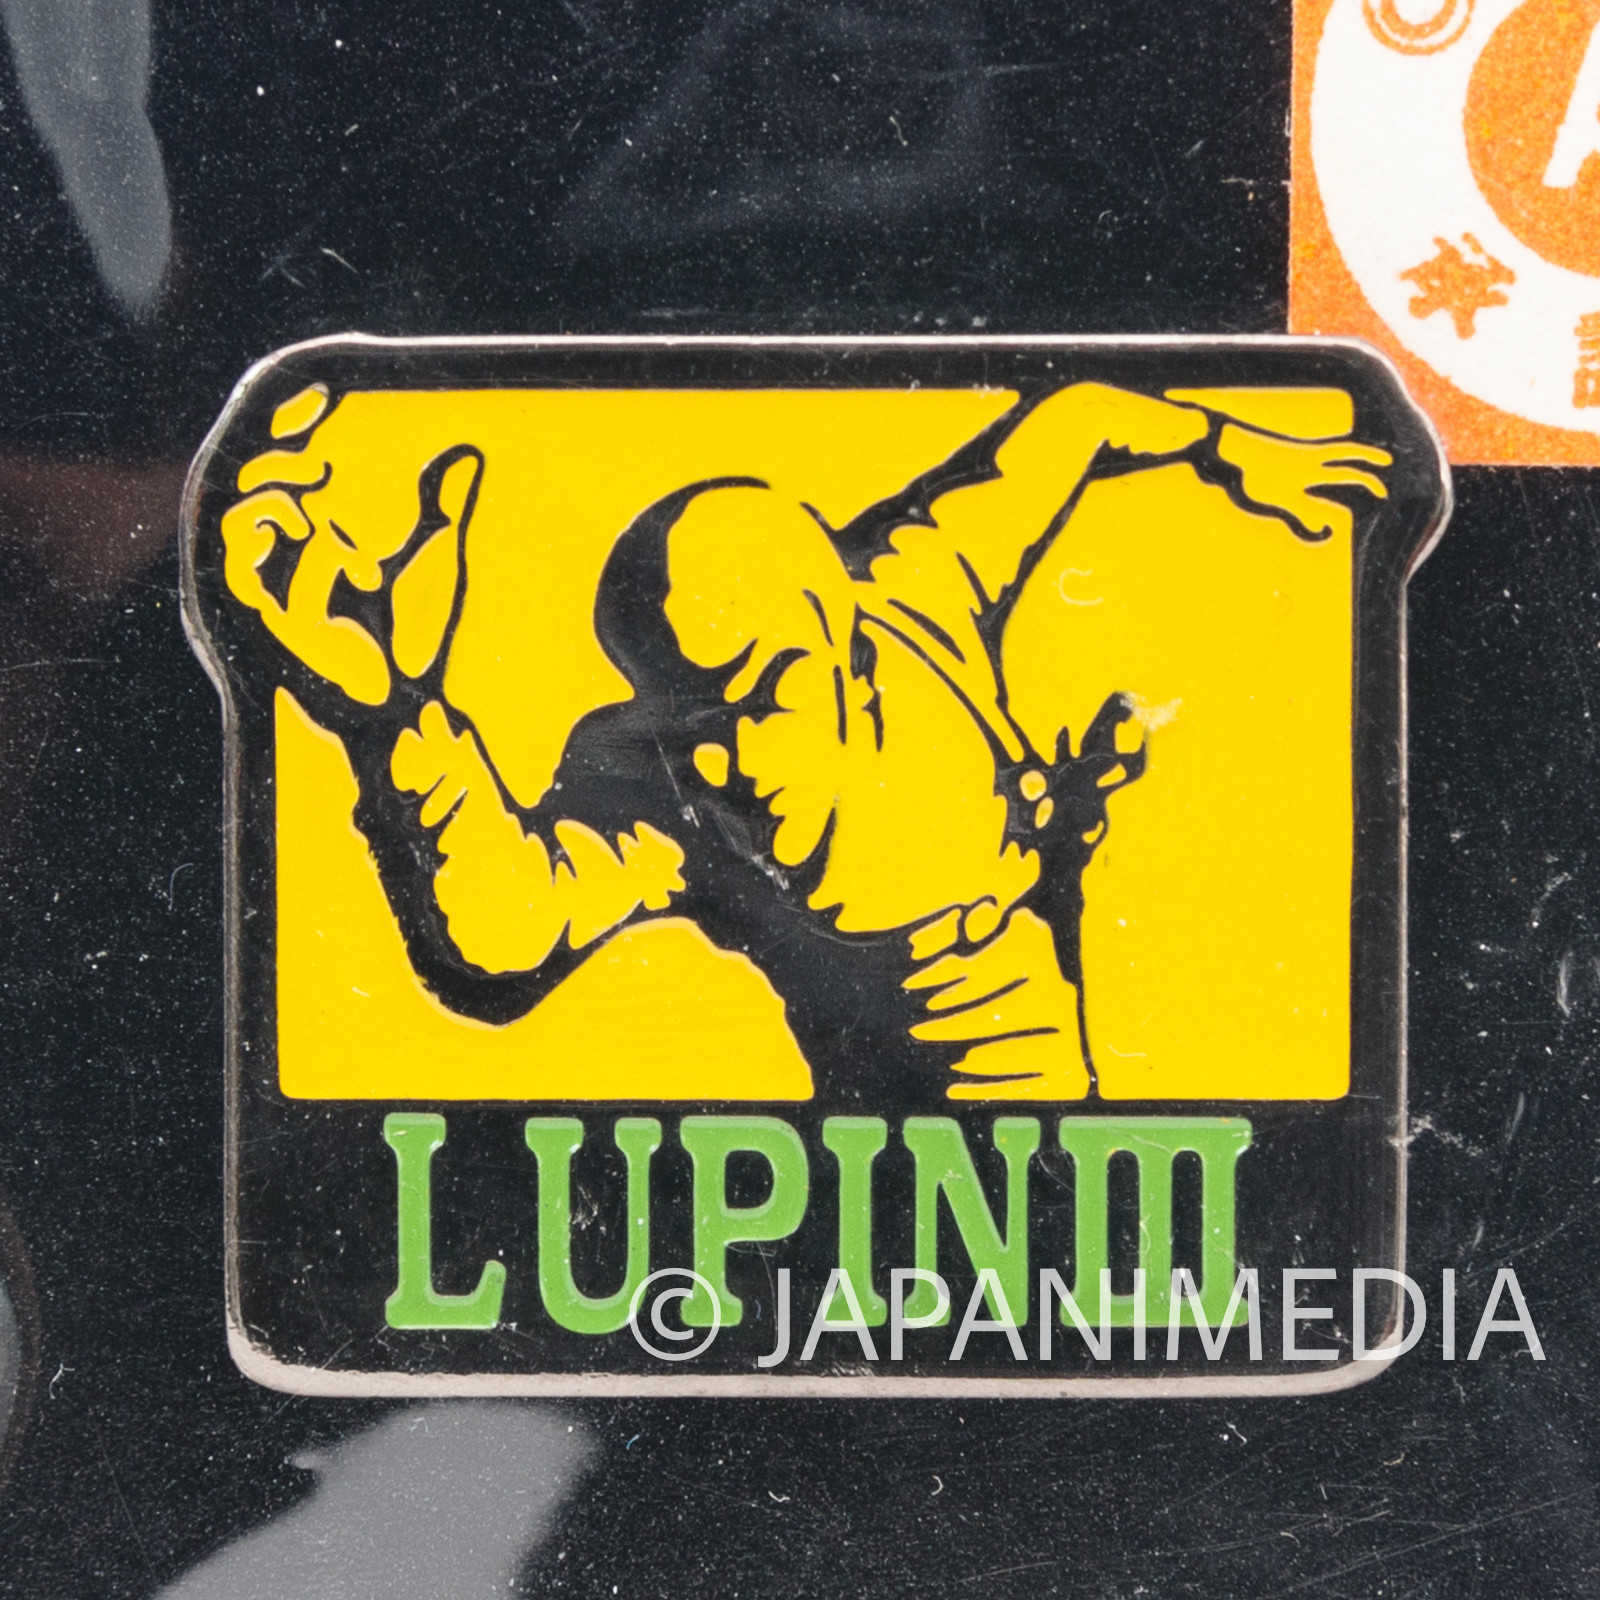 Lupin the Third (3rd) LUPIN Metal Pins JAPAN ANIME 2